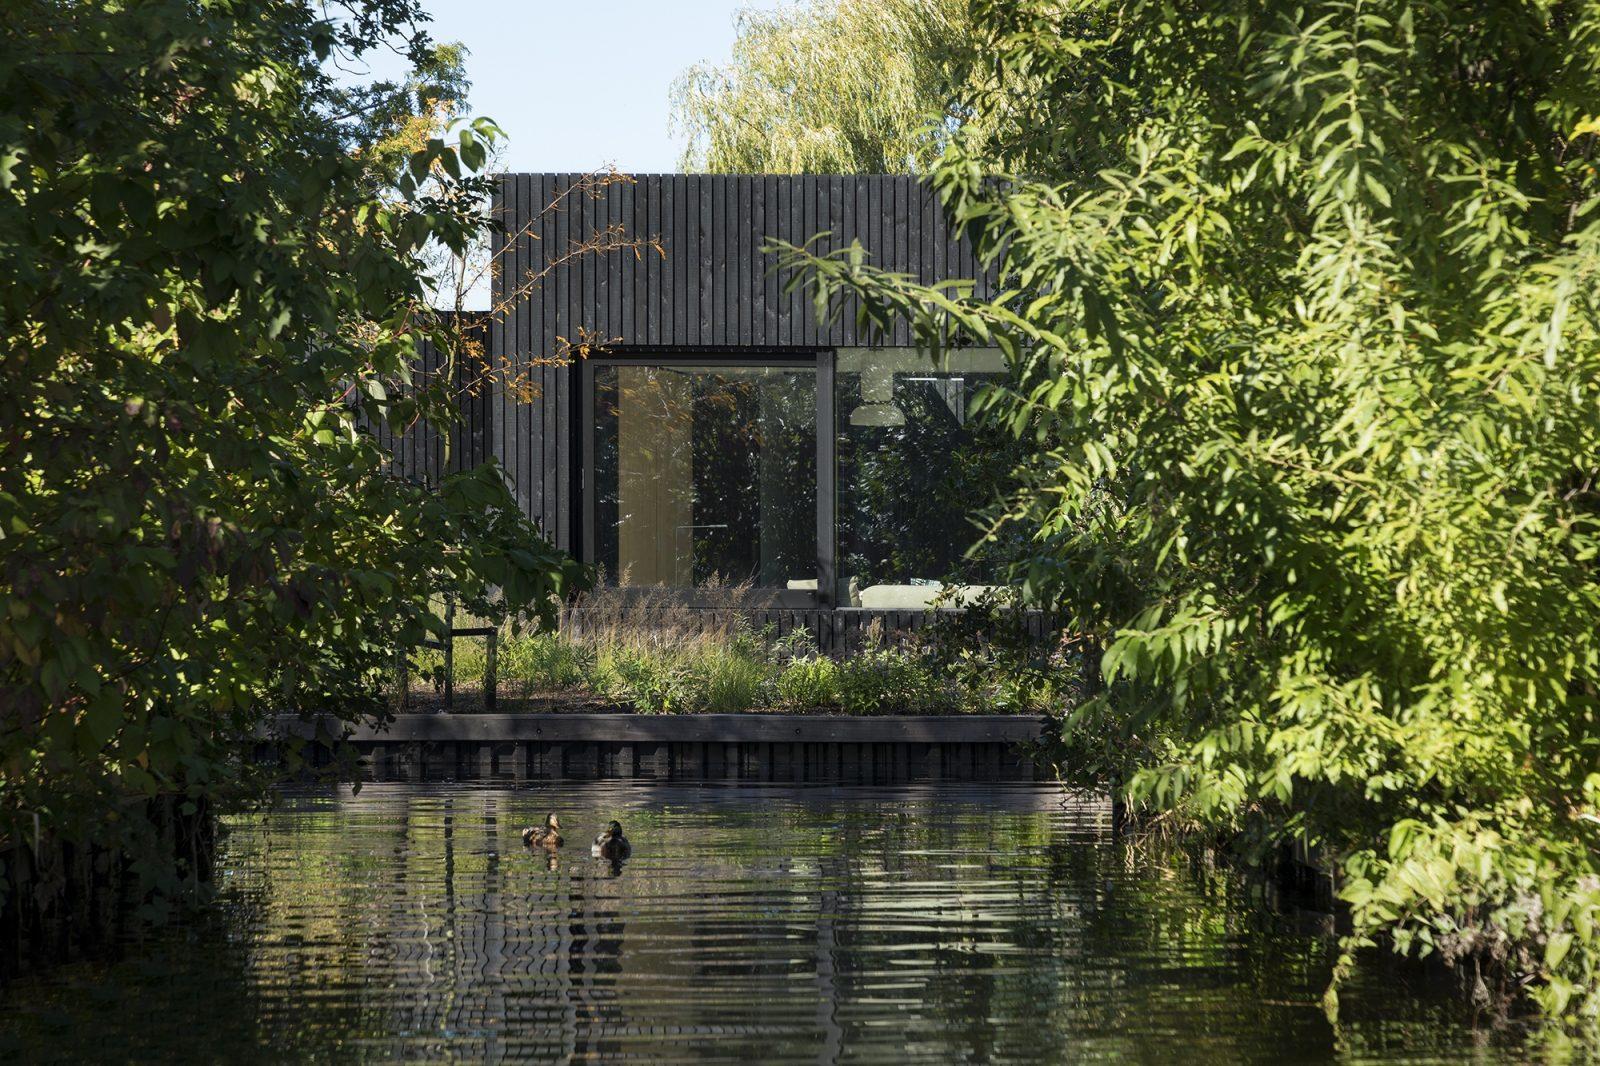 Tiny Holiday Home | Source: i29.nl